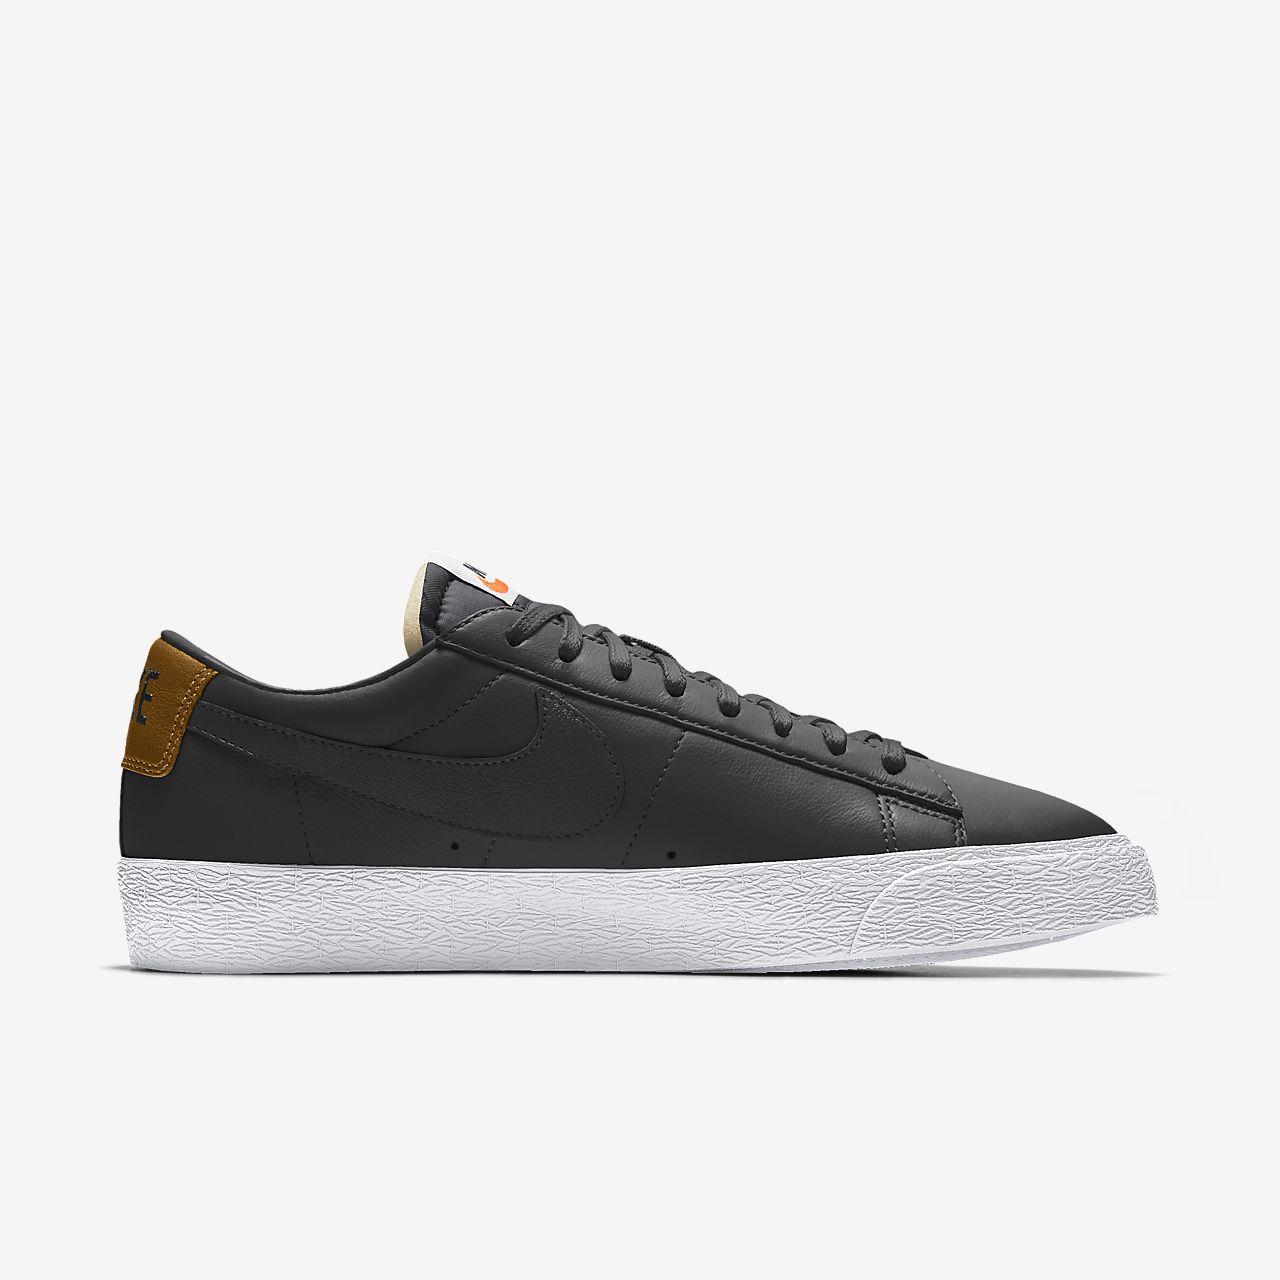 By personalisierbarer Schuh für Damen Nike Low Blazer You lKJ1cF